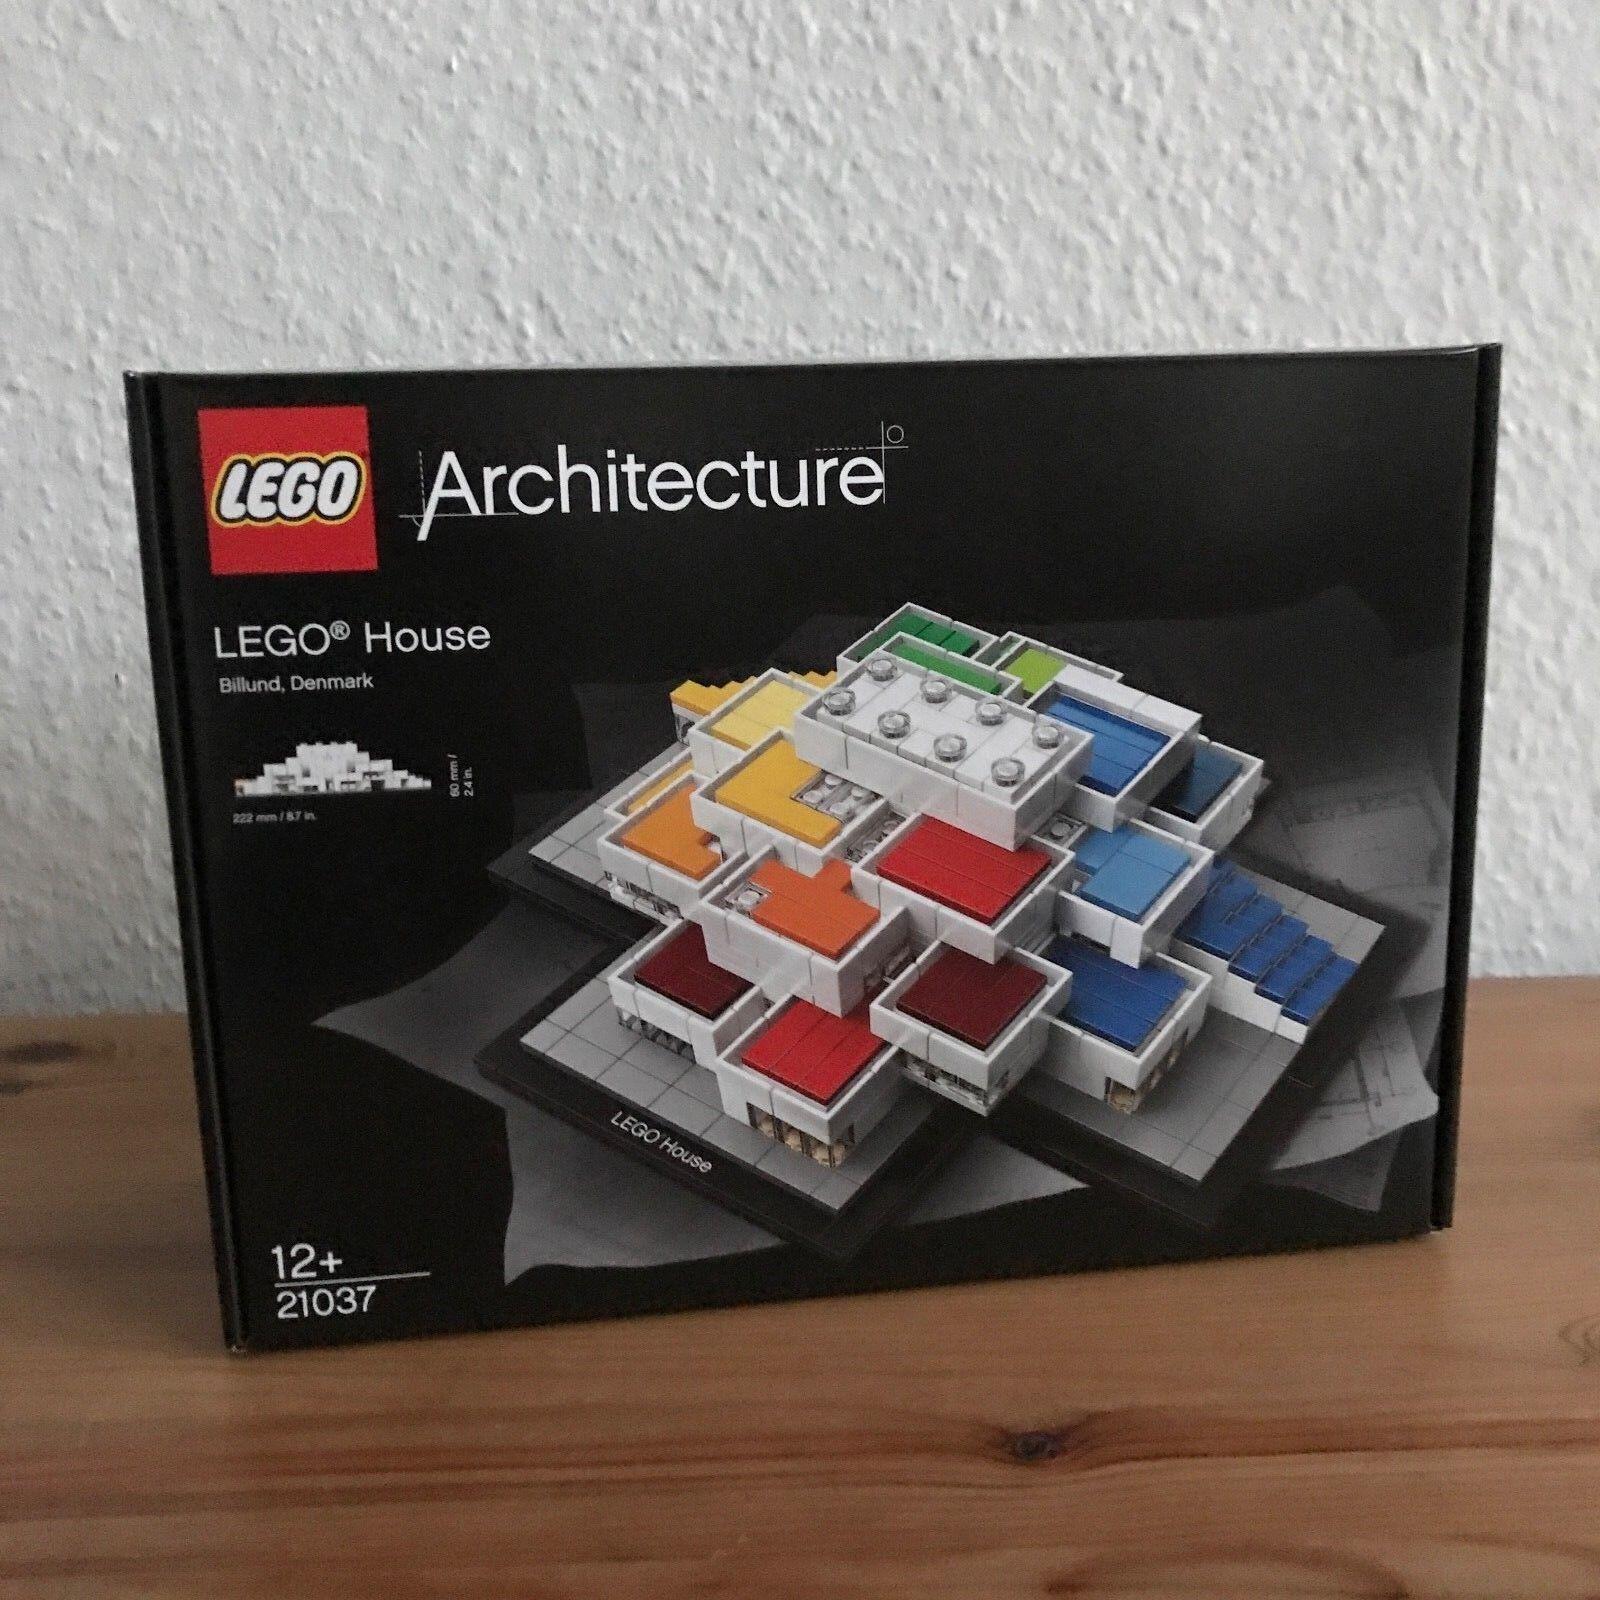 Lego set 21037: Lego House (Exclusive-Lego store in Billund, DK